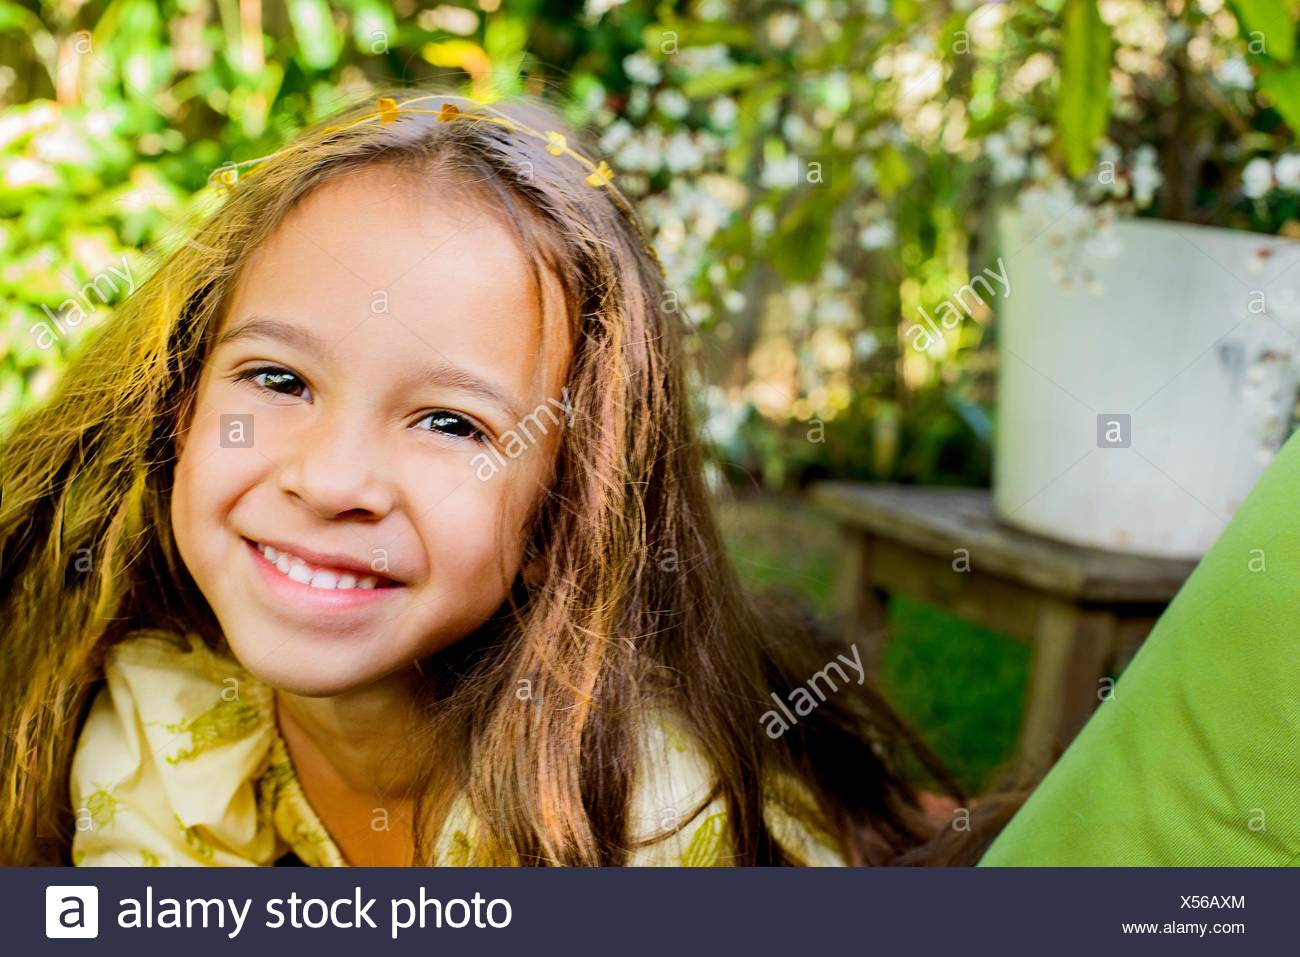 Portrait of pretty smiling girl in garden Photo Stock